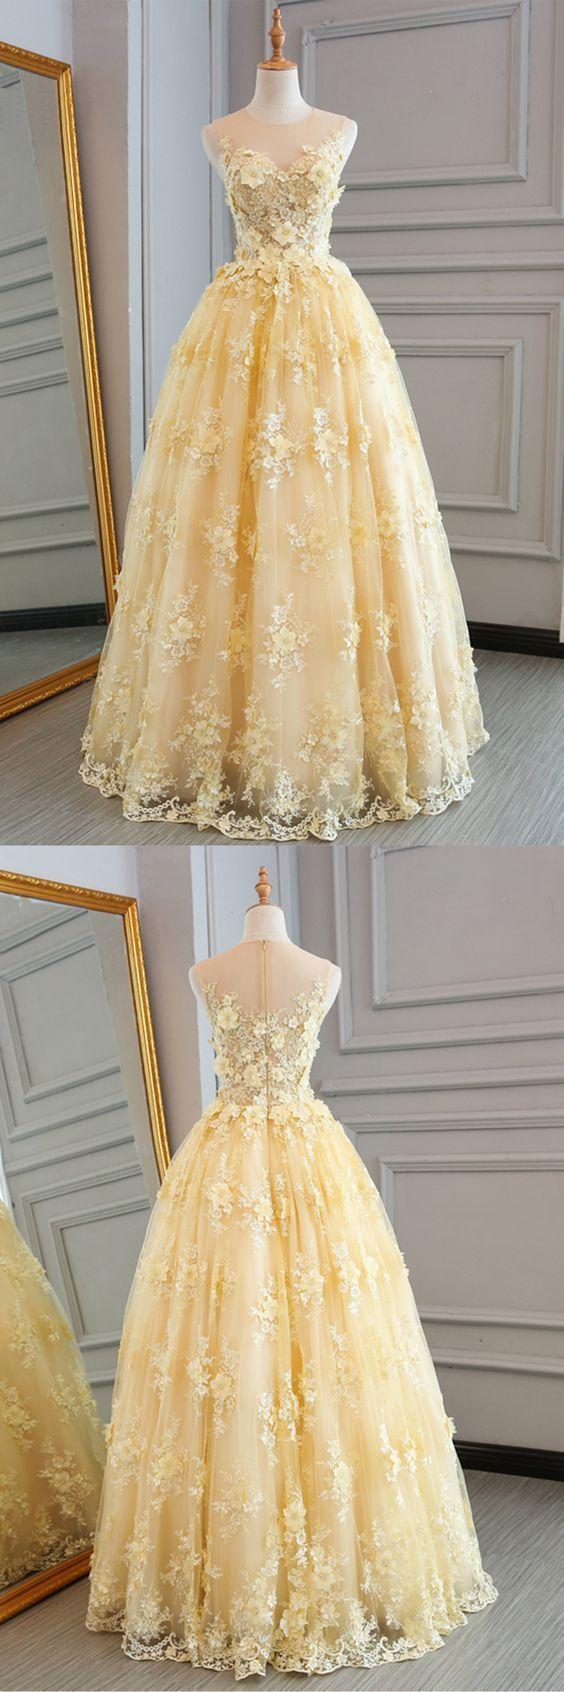 Yellow lace customize long aline senior prom dress long lace